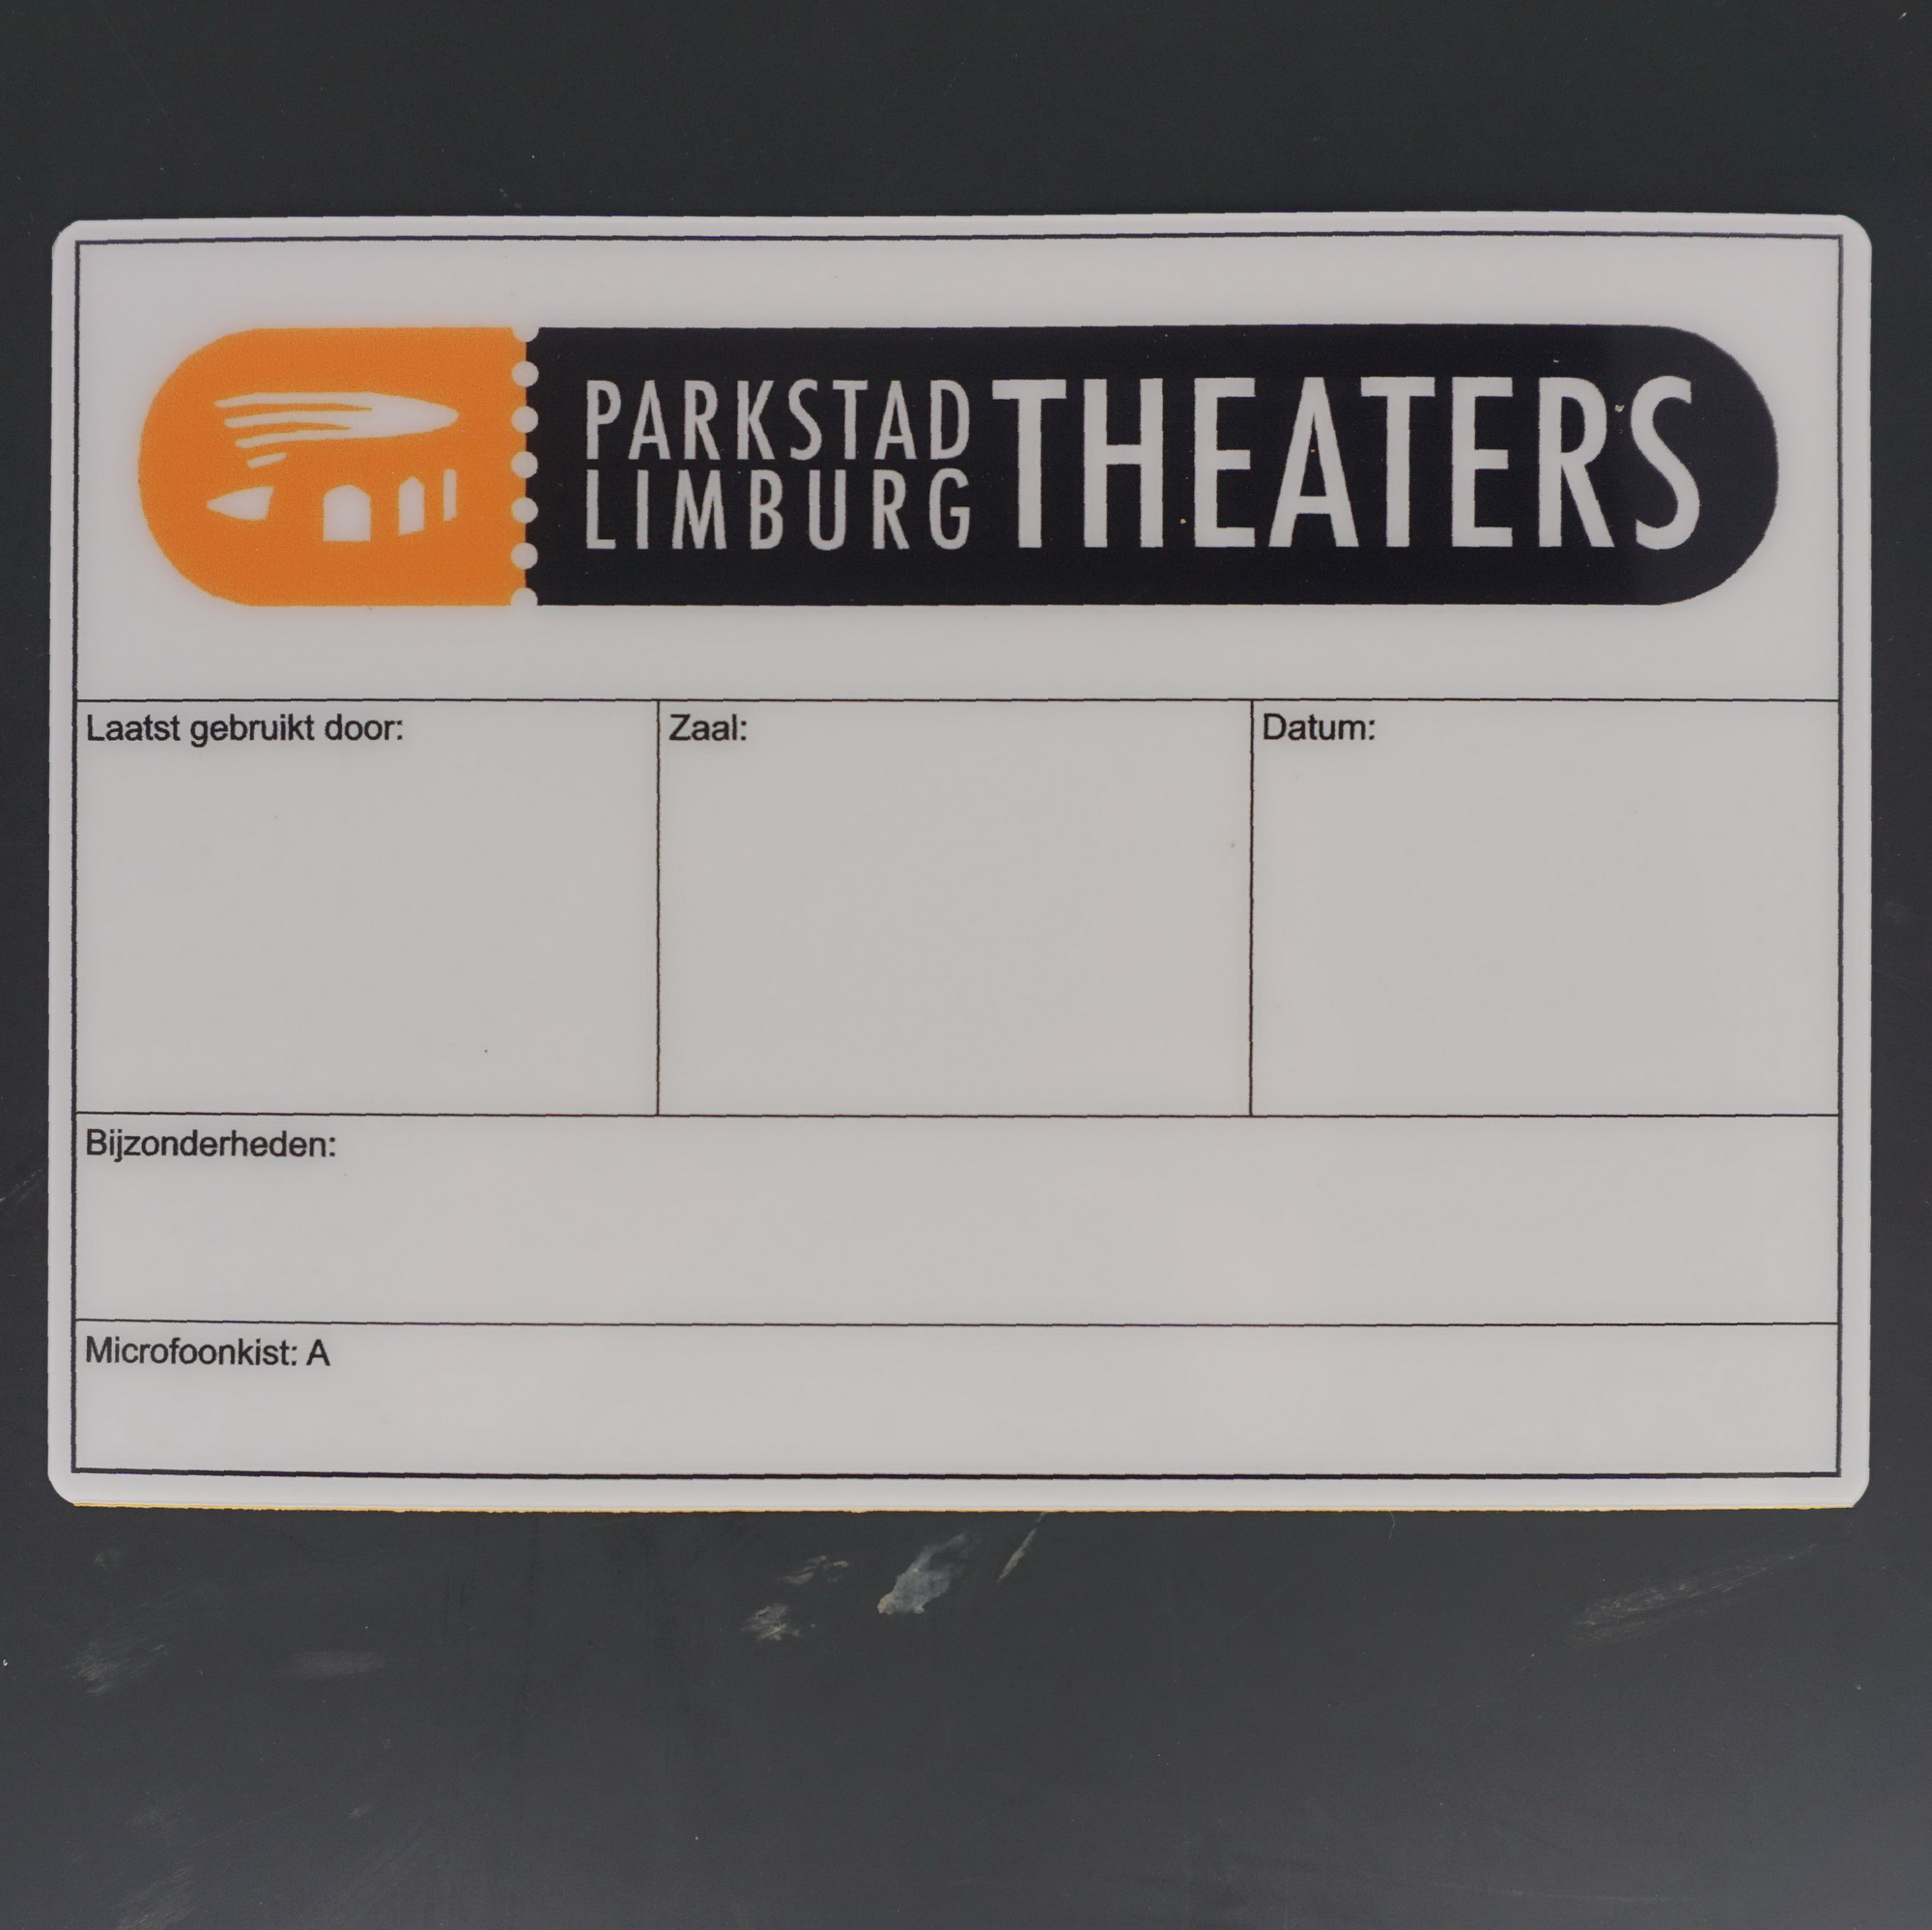 Flightcaselabels Caselabels Parkstad Limburg Theaters